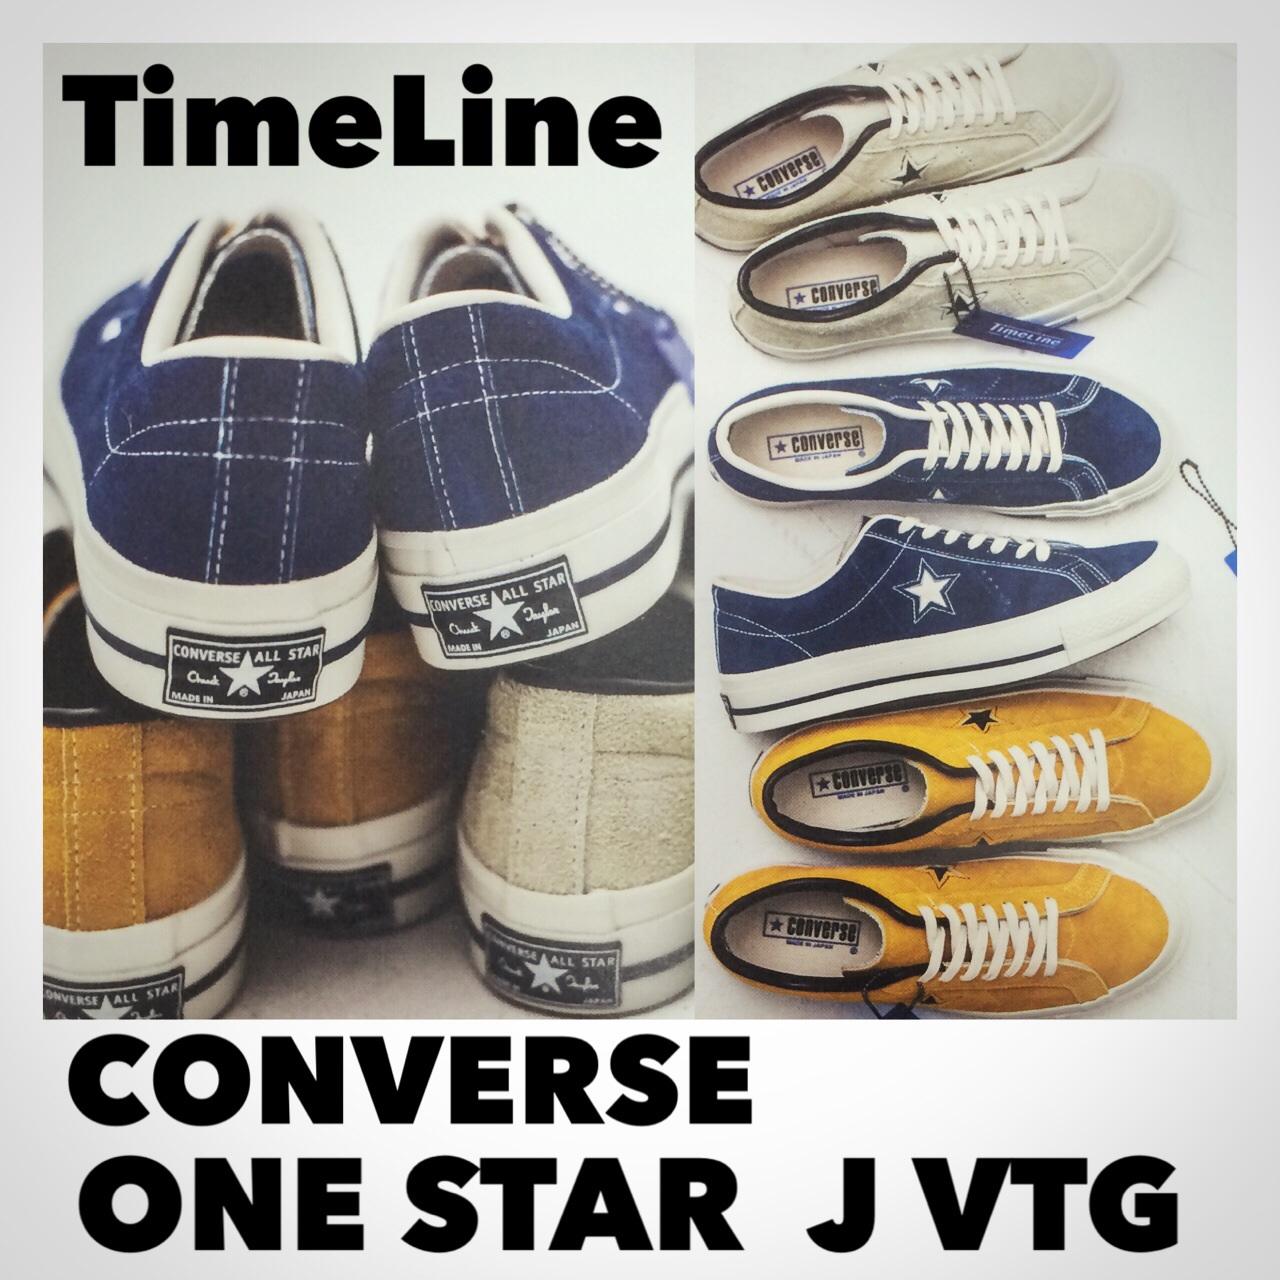 converse one star j vtg